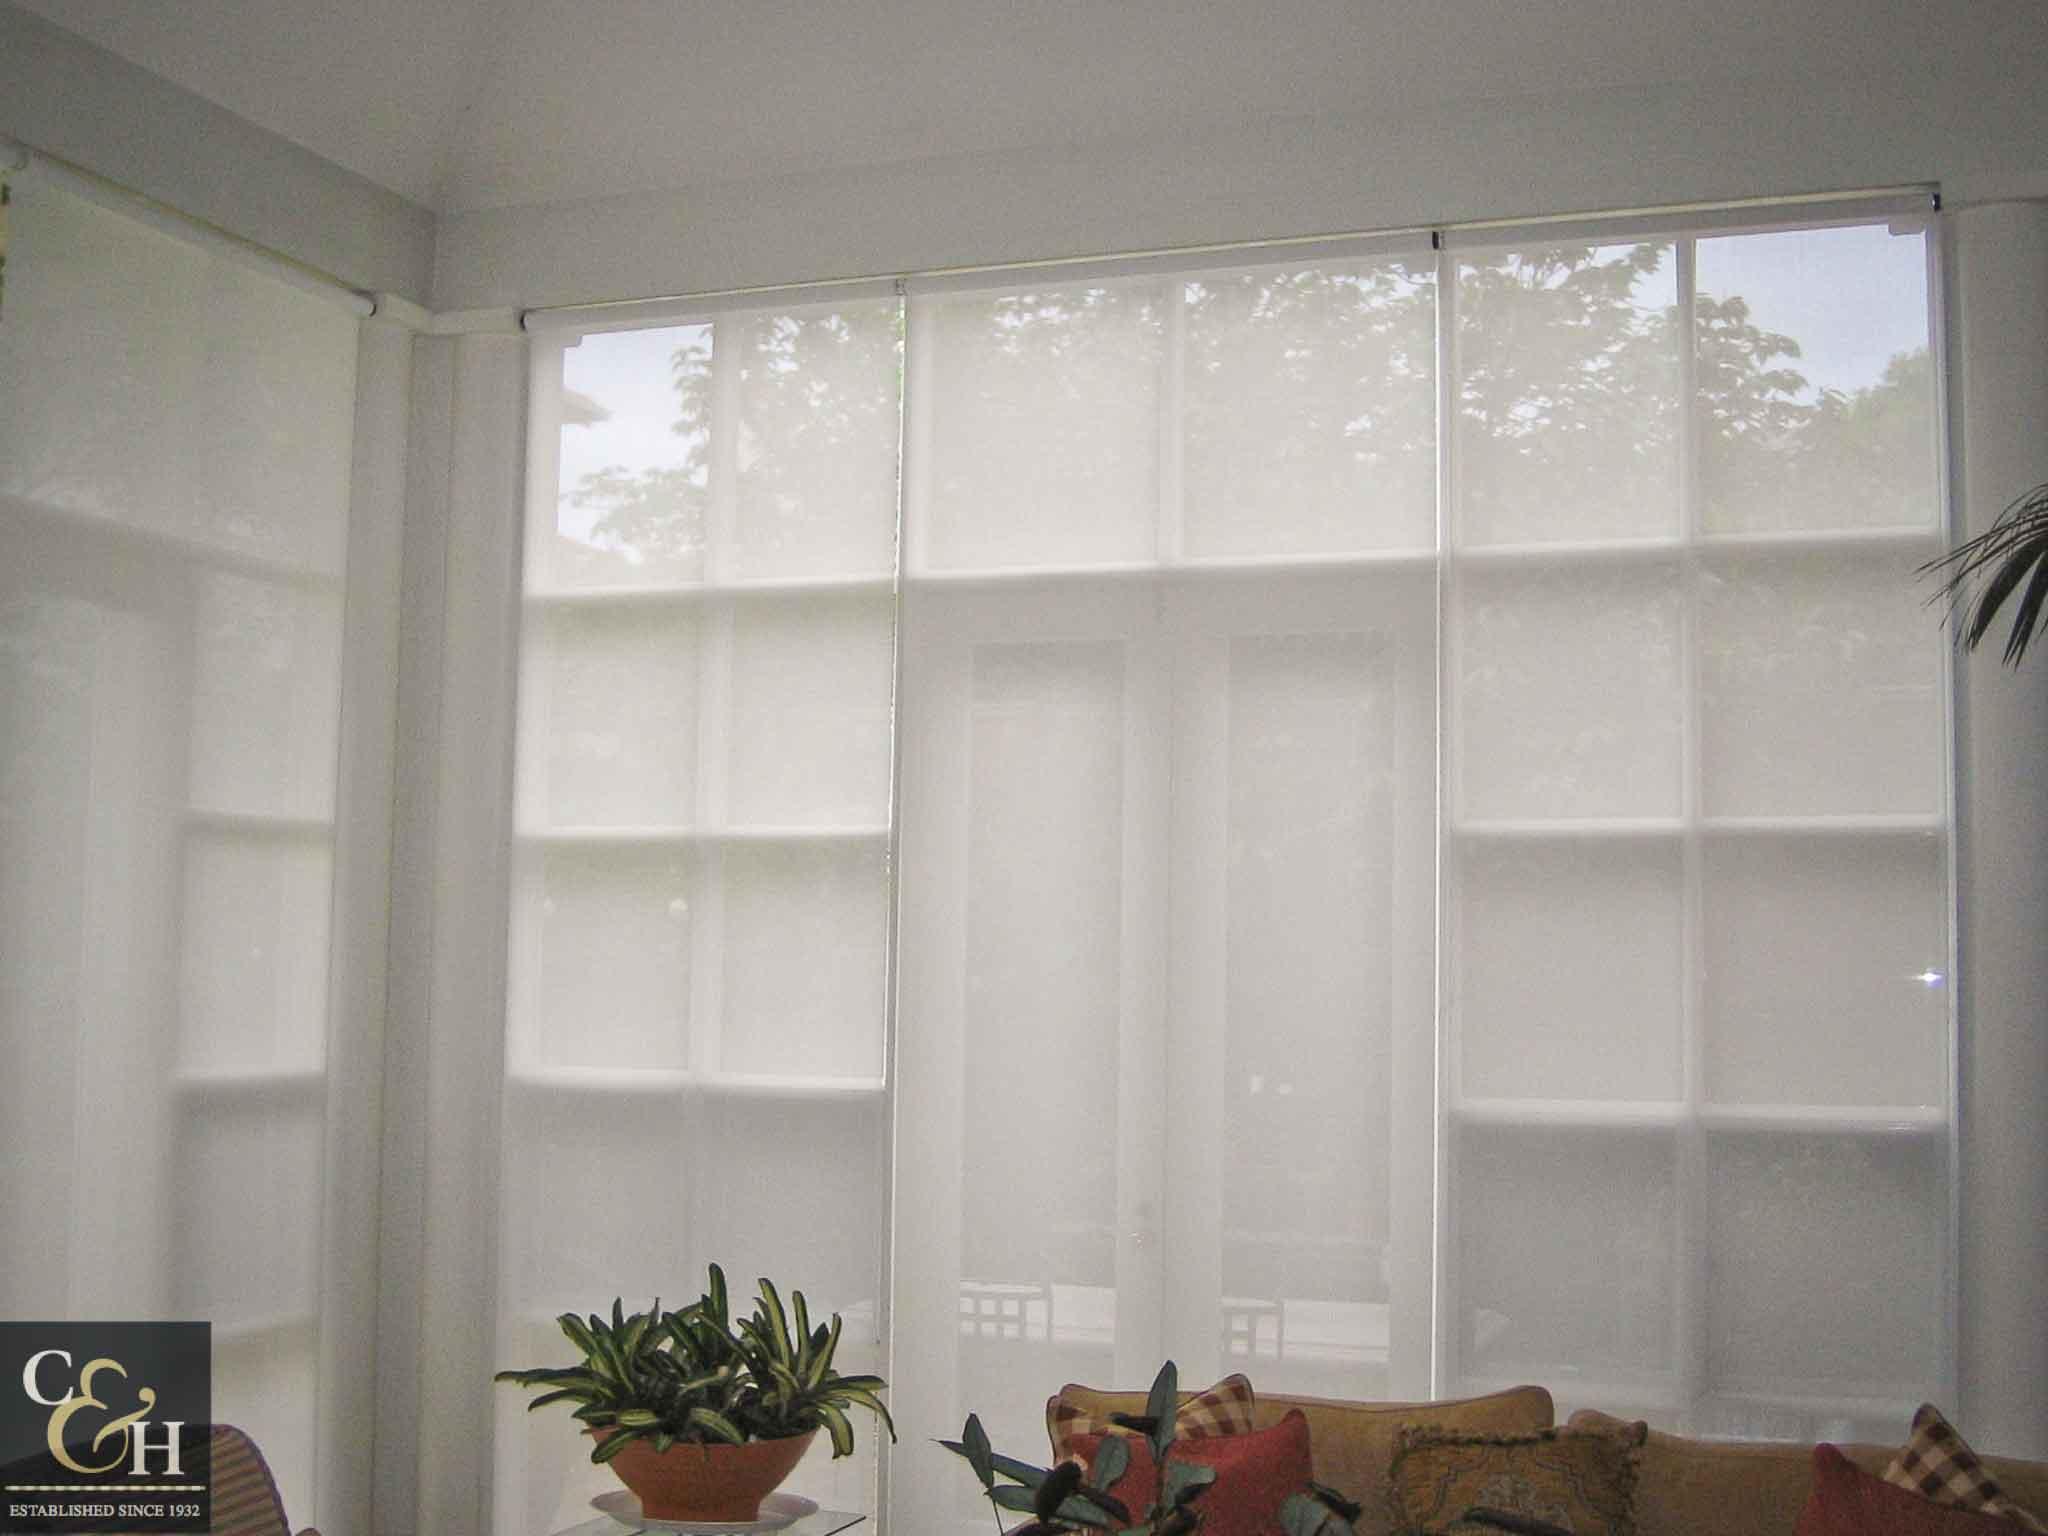 Screen-Roller-Blinds-16.1 inside a living room